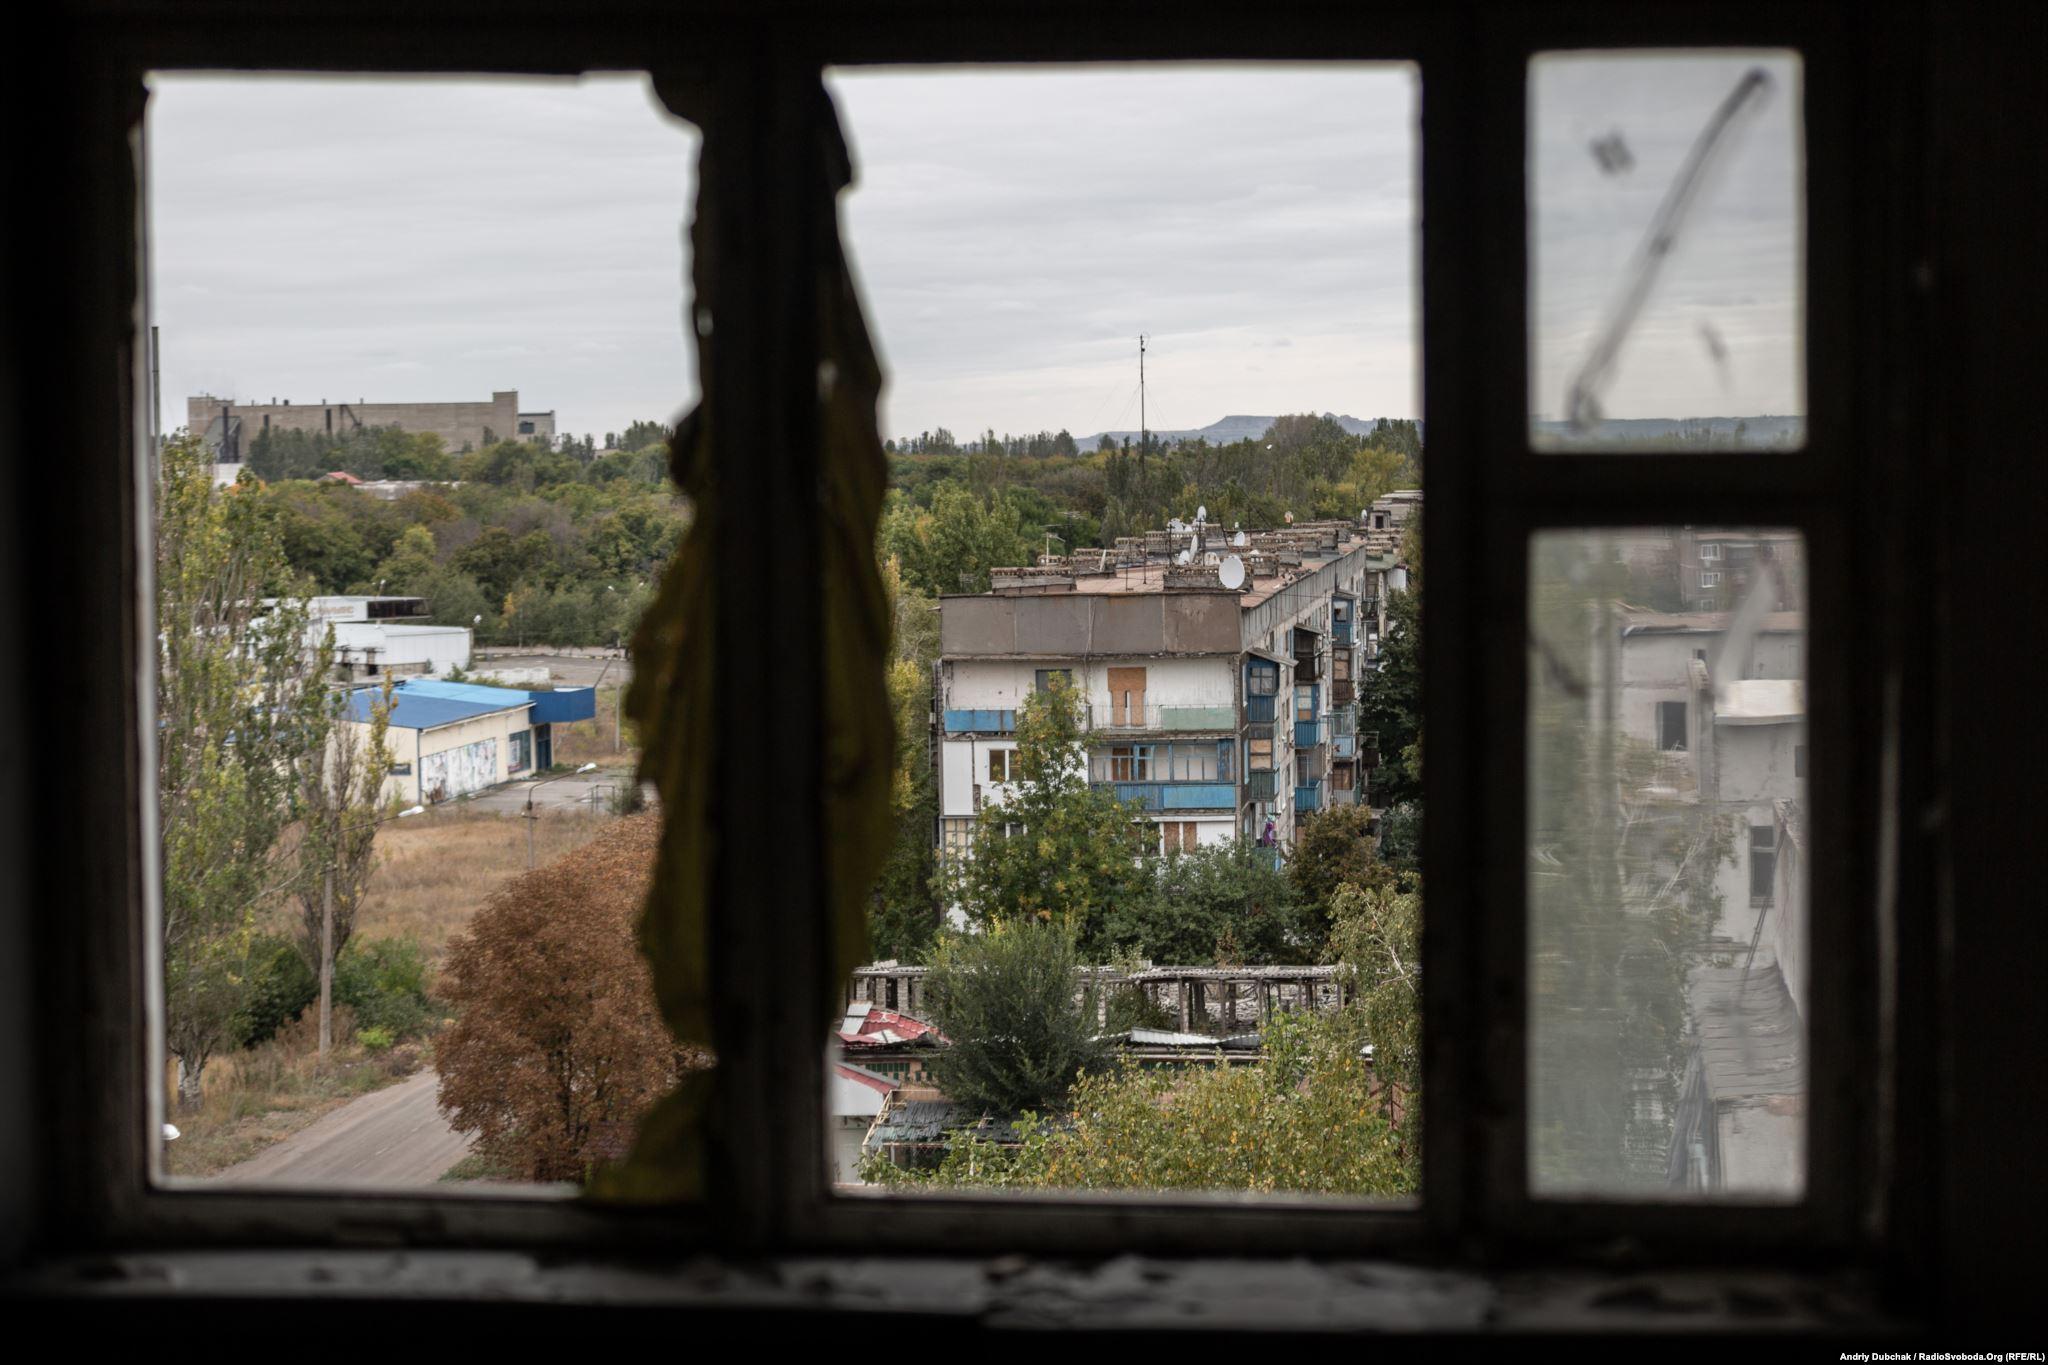 A window damaged by shelling in Sofia's five-story Krasnohorivka apartment building. (photo: Andriy Dubchak)